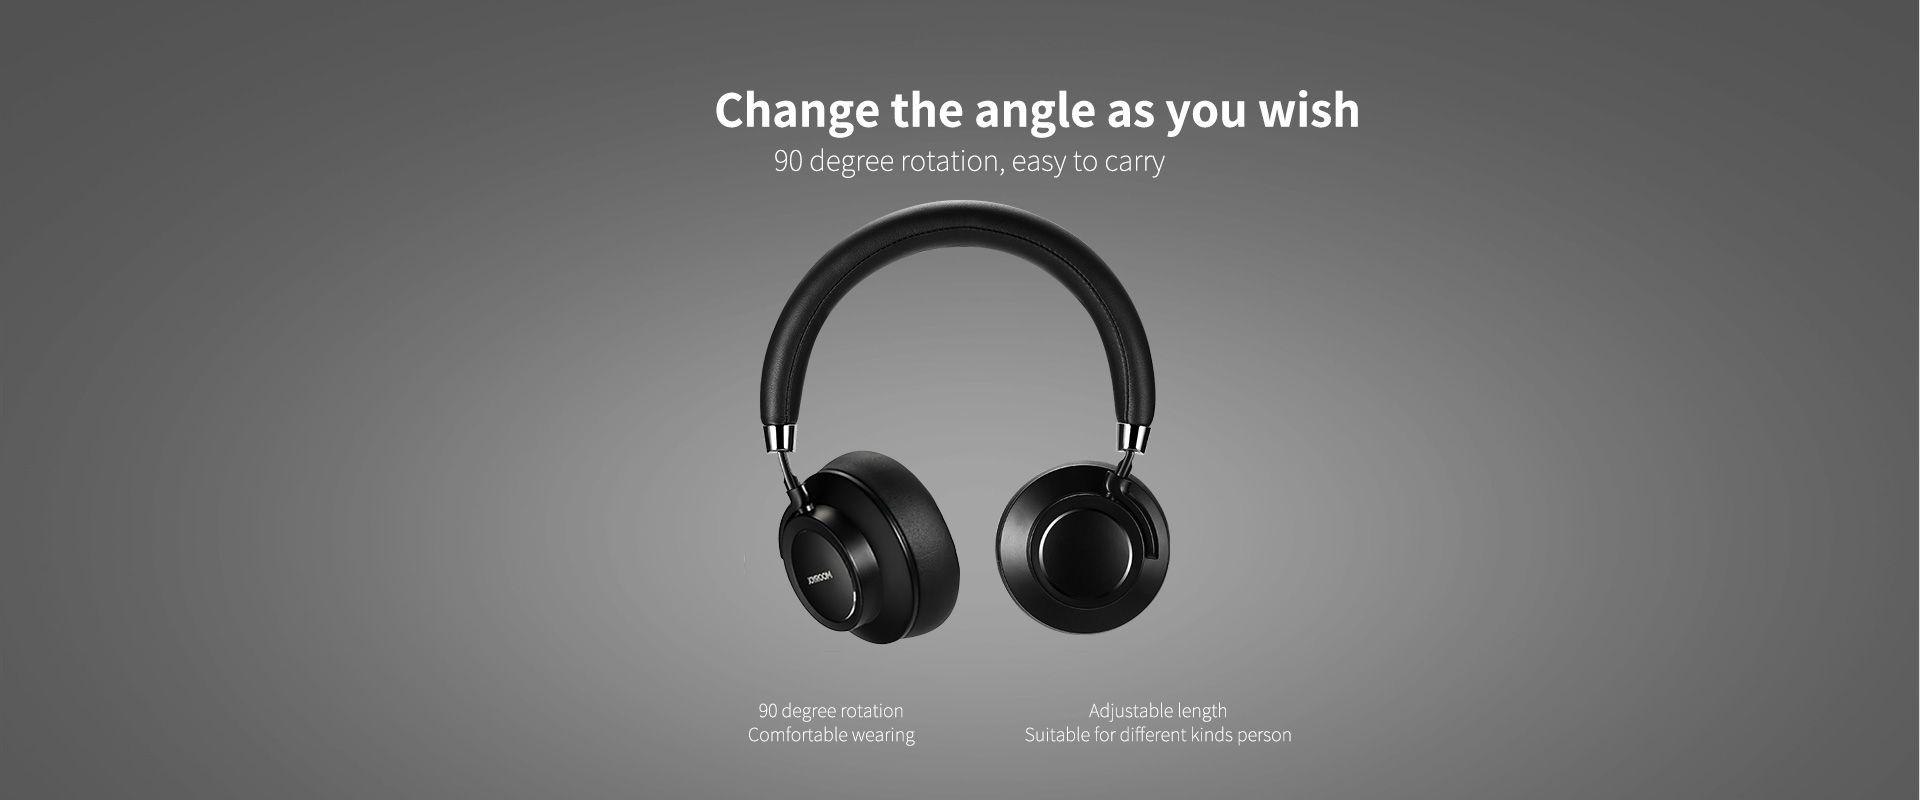 1c85bdf1d06 JOYROOM , JR-H12 bluetooth headphone 90 degree rotation easy to carry ,  long battery